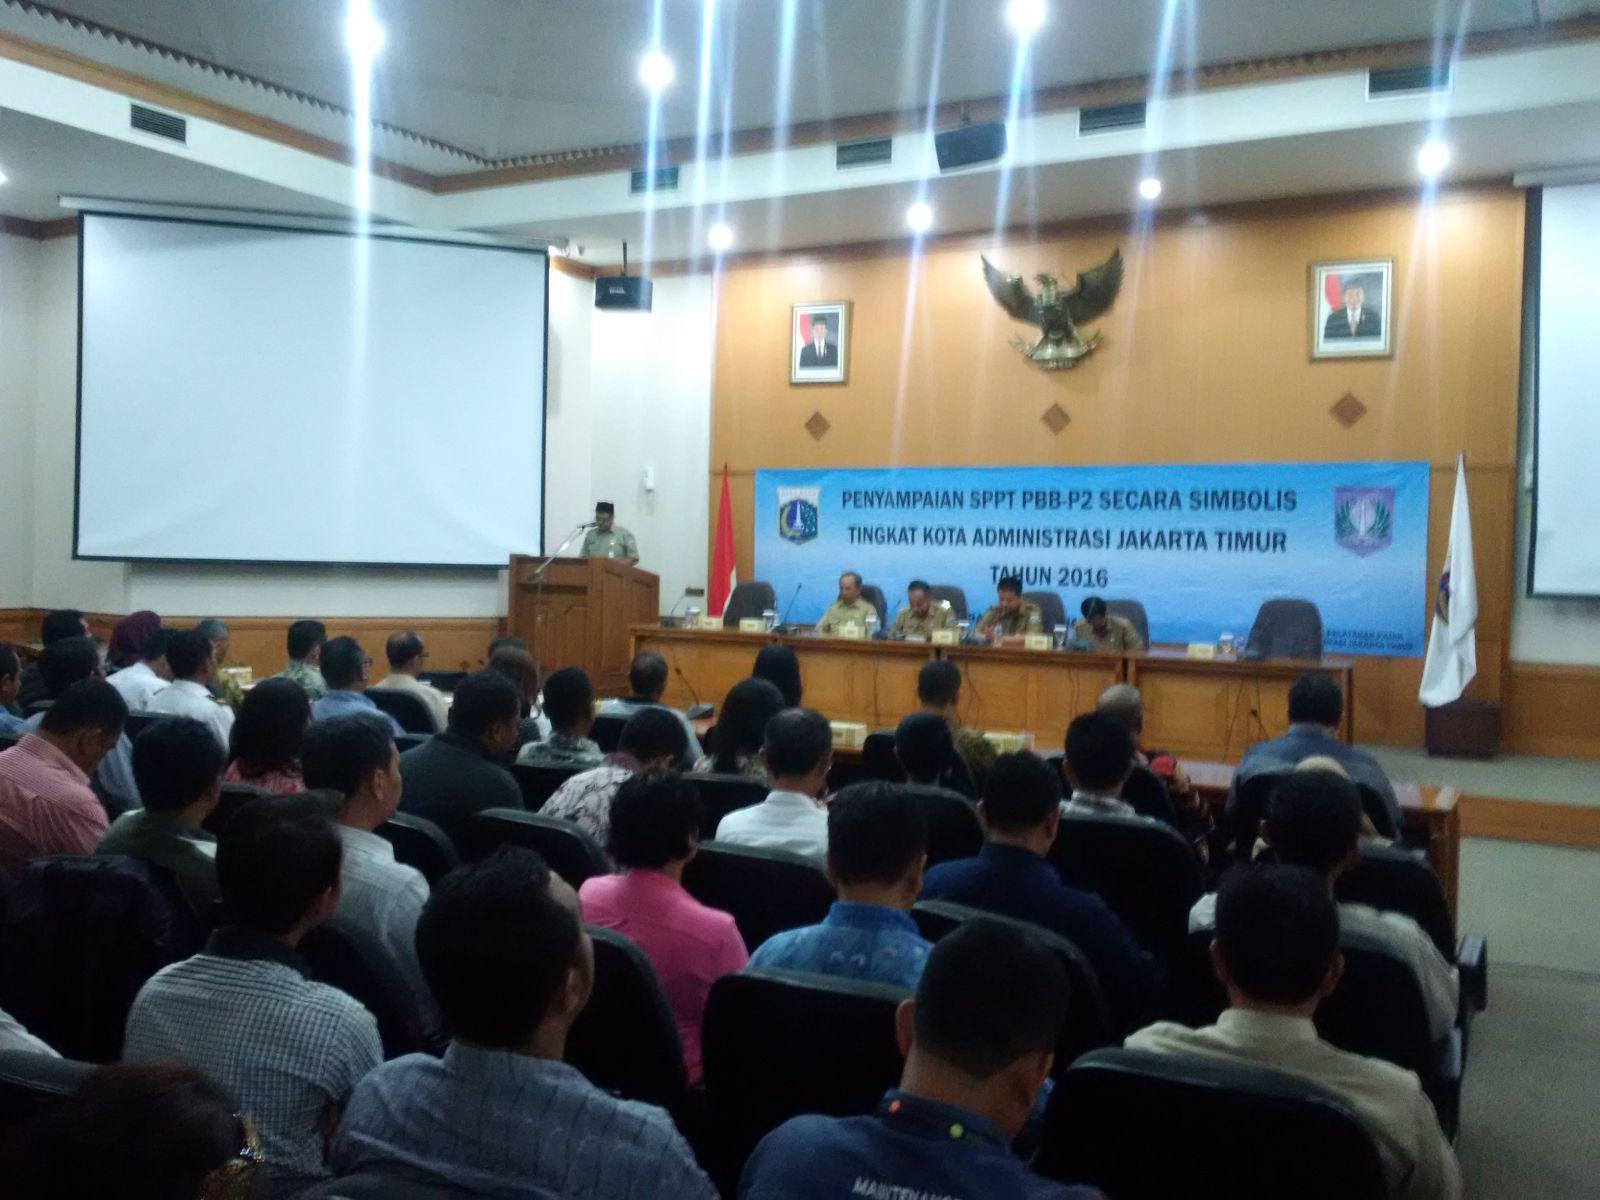 Penyampaian SPPT PBB di Jakarta Timur